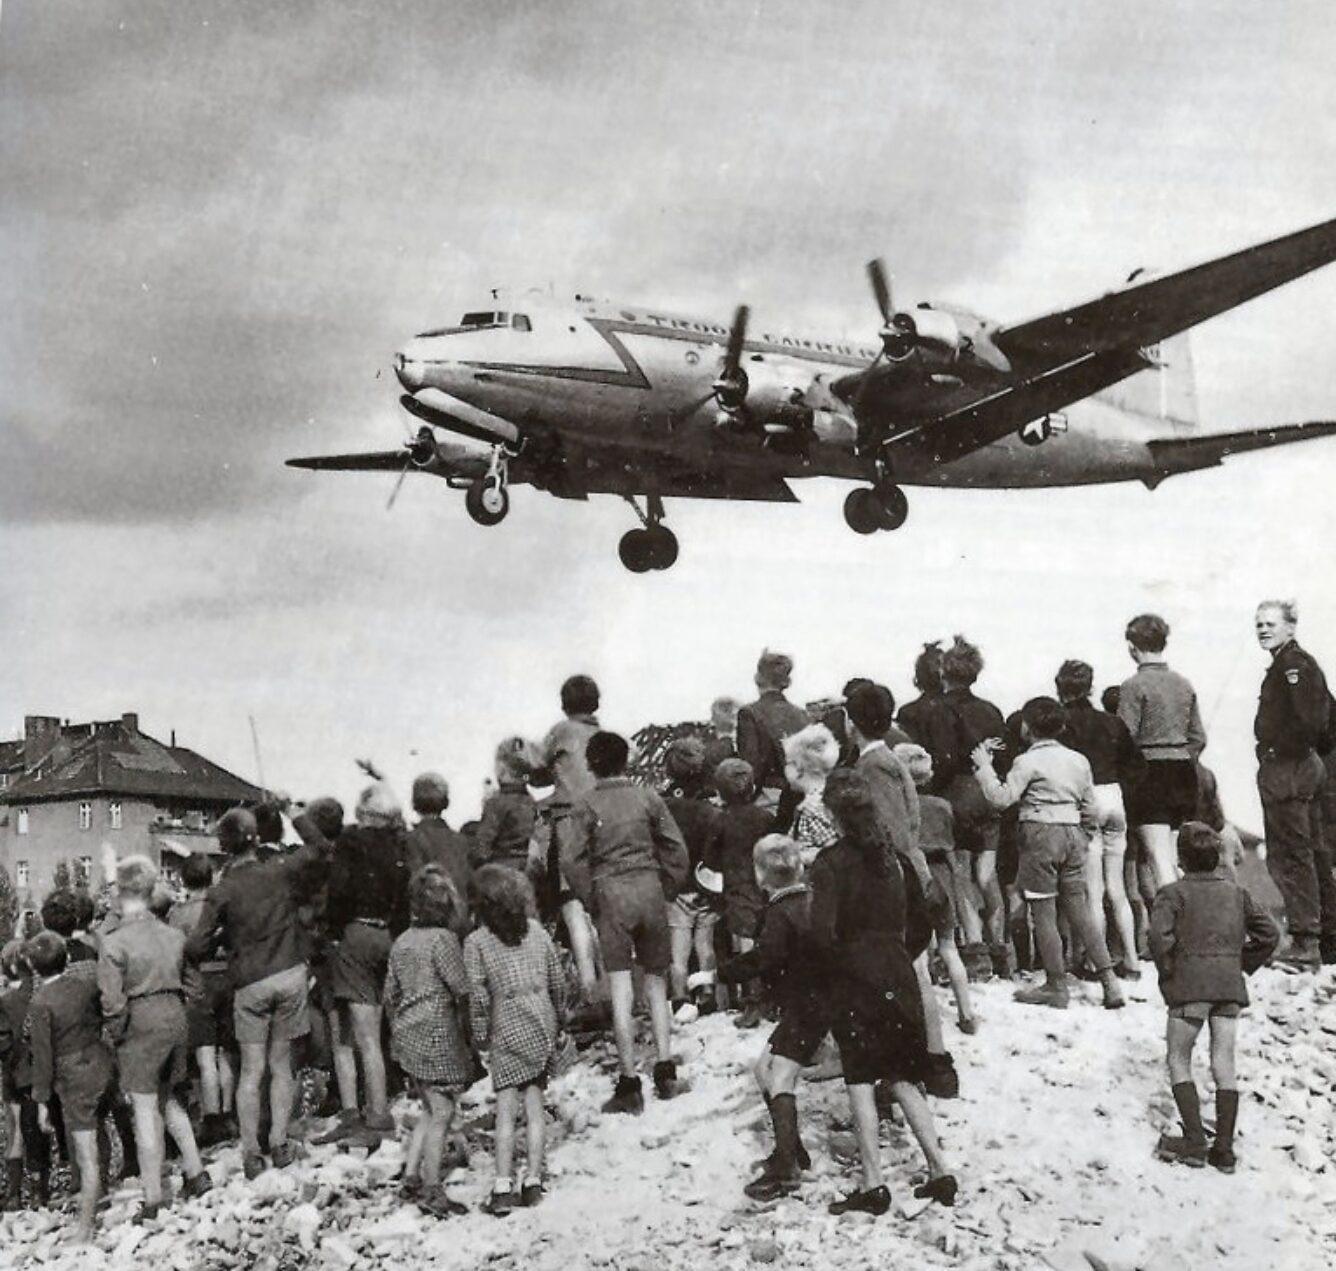 Flugzeug auf Berlin Tempelöhof